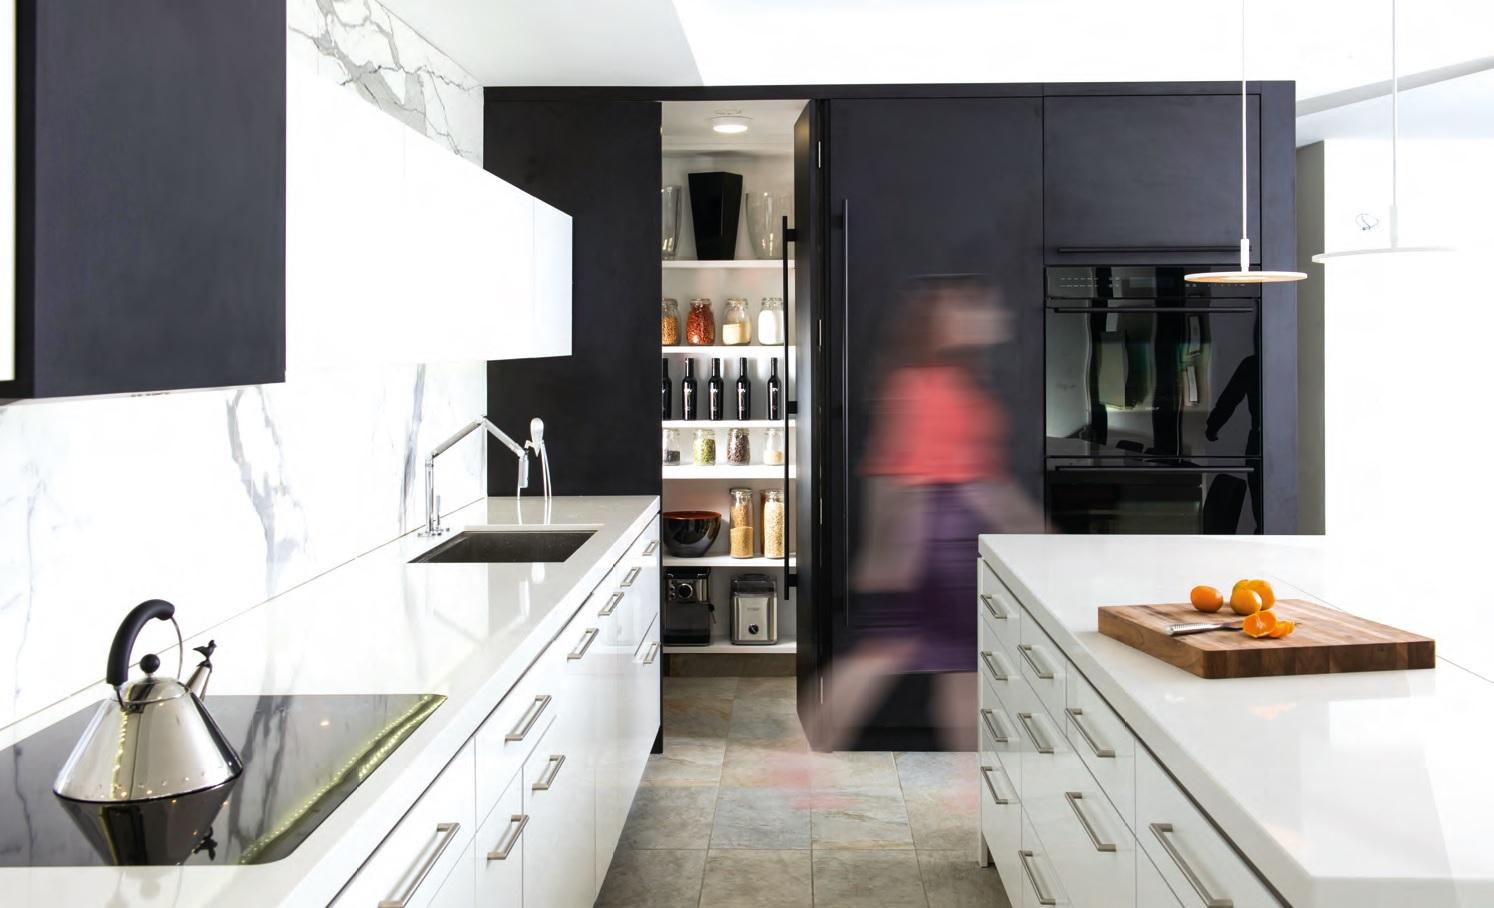 cucina moderna al centro della casa ville casali